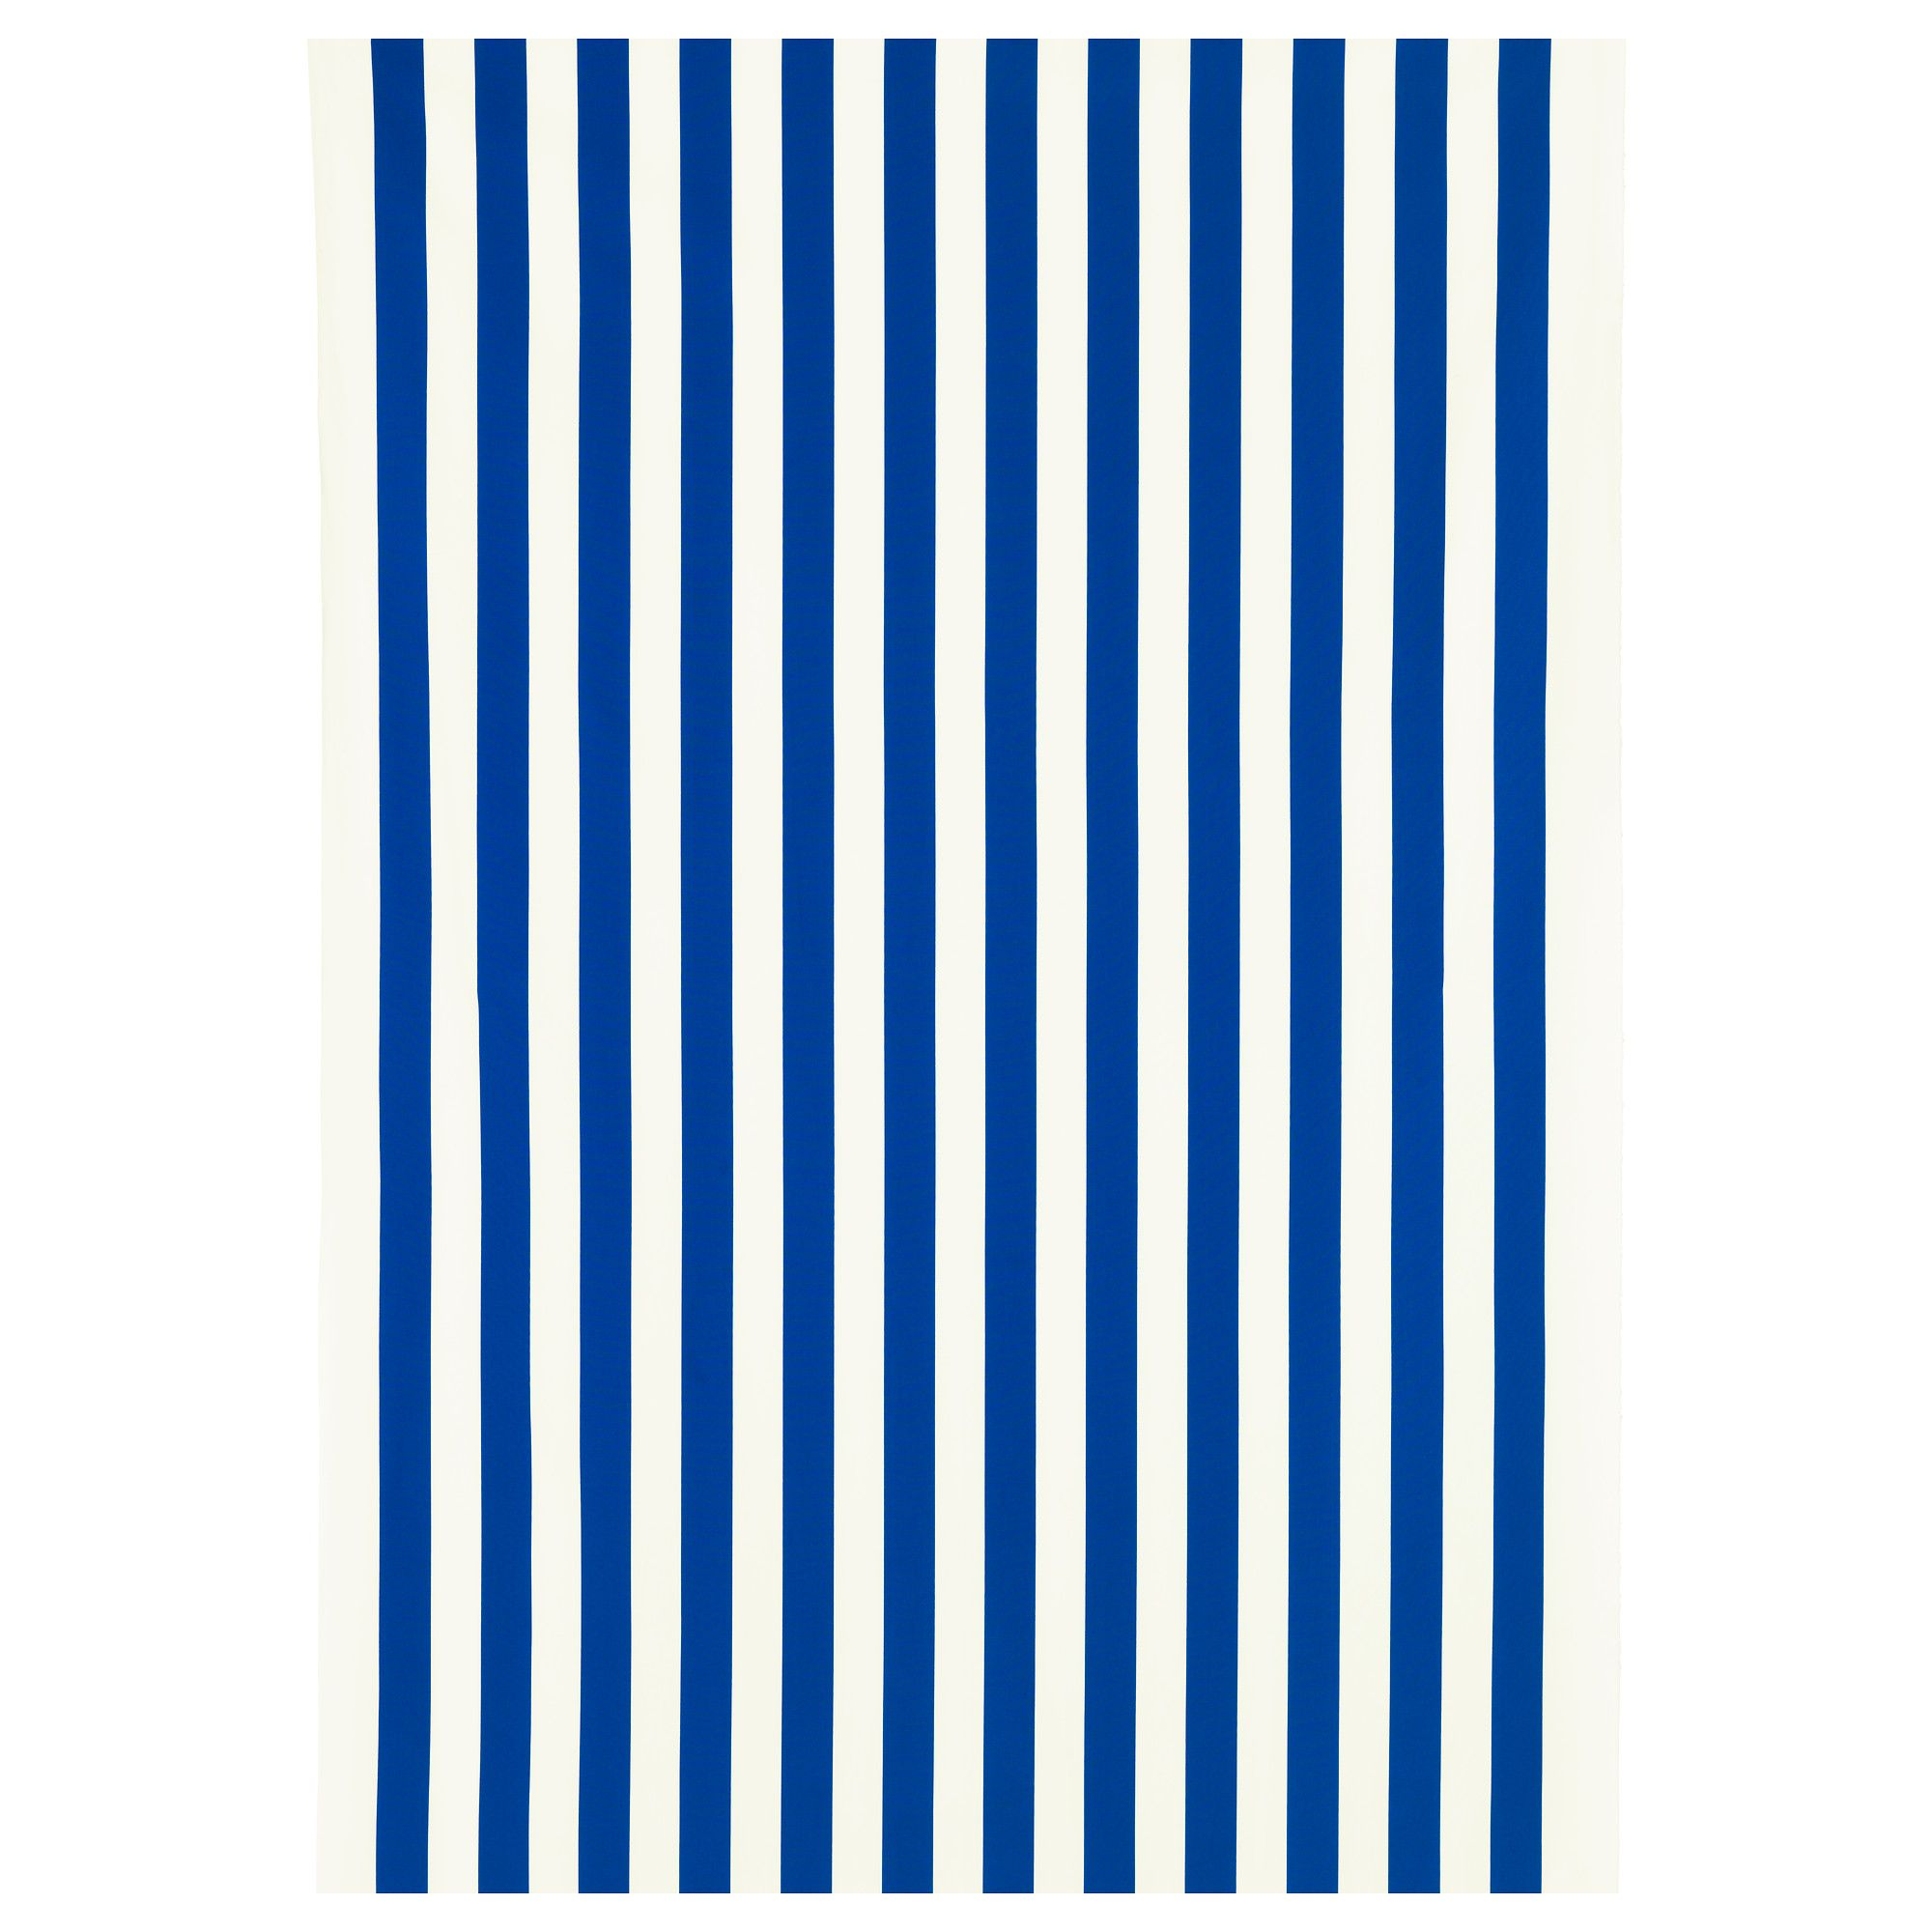 Ikea curtains blue - Sofia Fabric Ikea Fabric For Dog Beds Fabric Wide Stripe Bright Blue 7 99